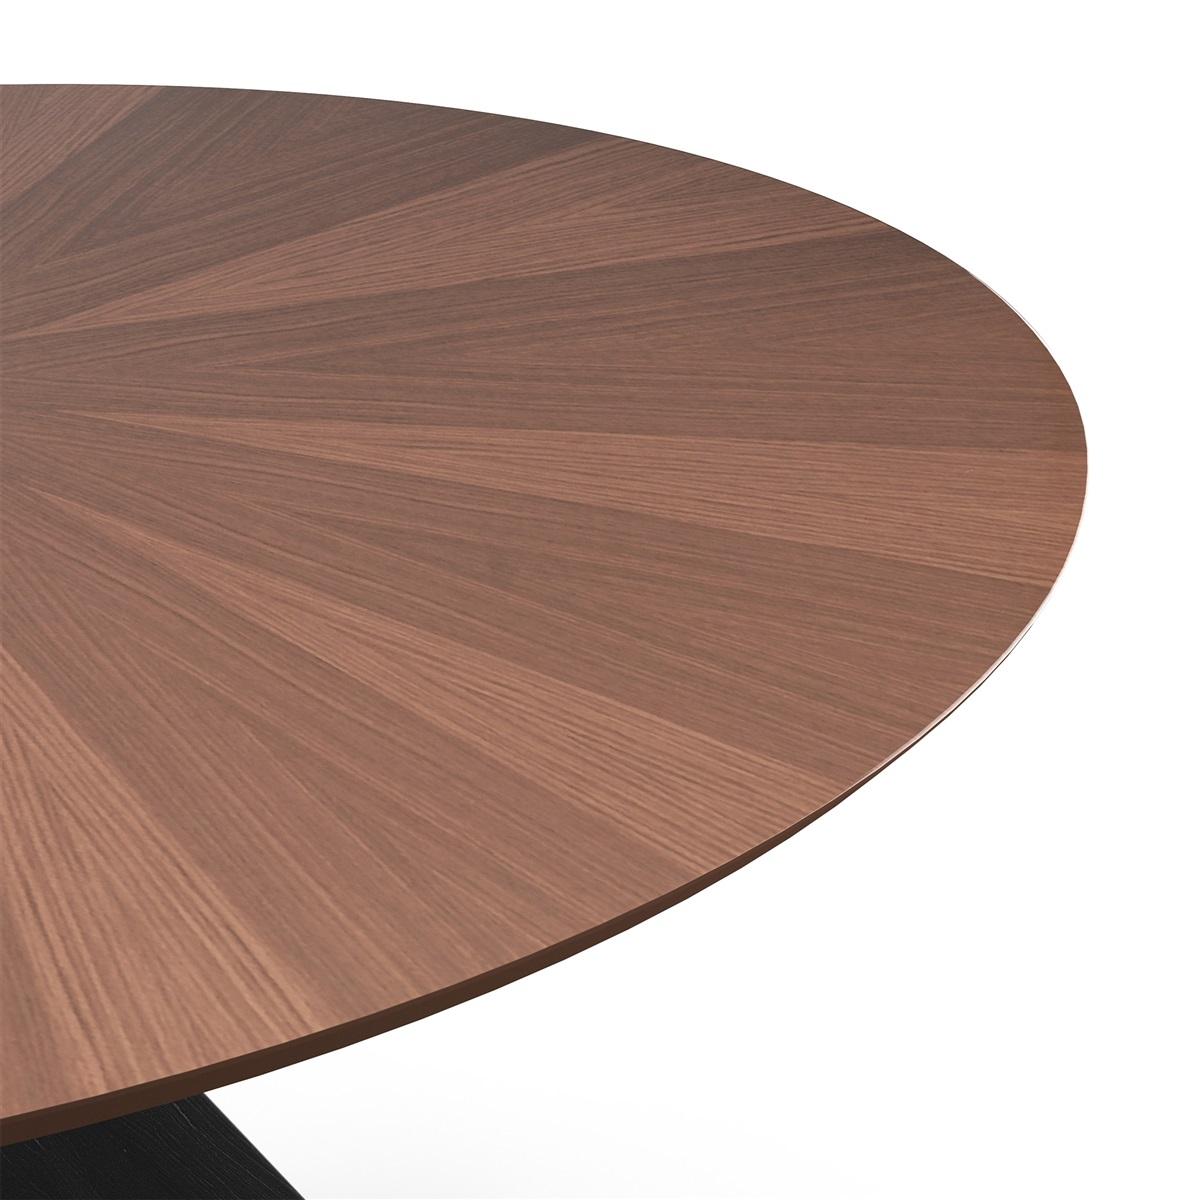 Round Table Marysville.Starburst Round Dining Table